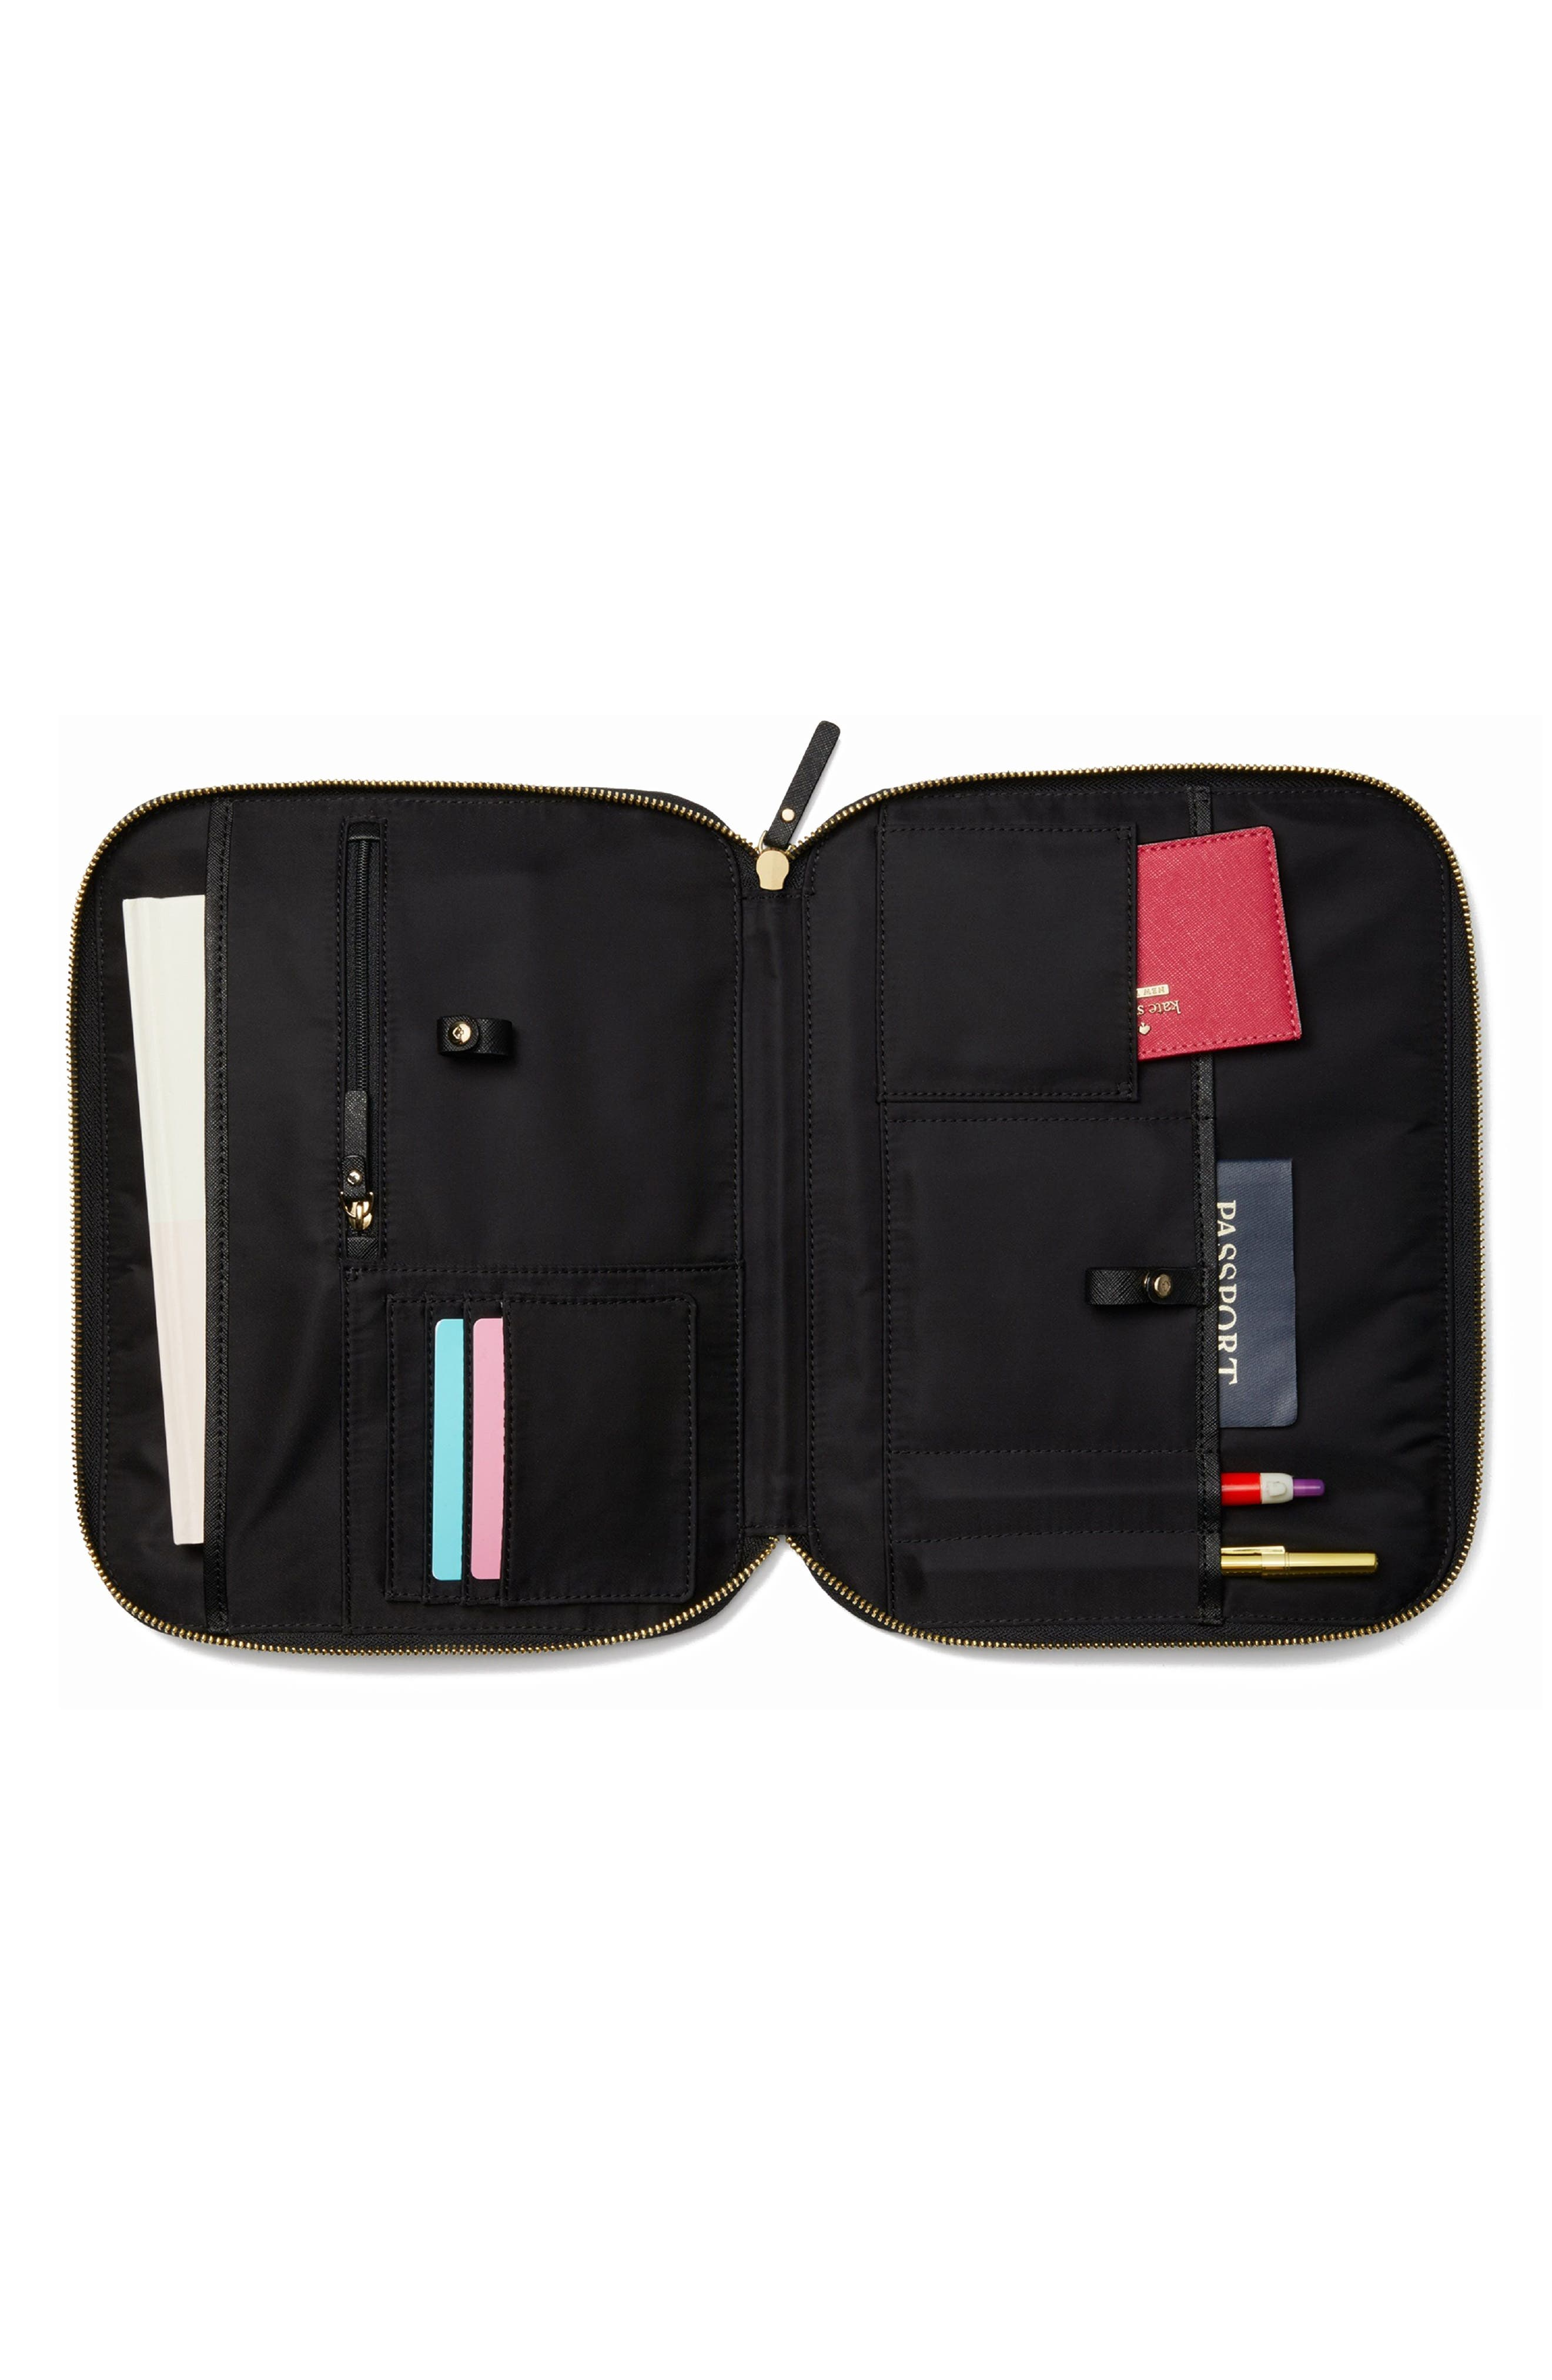 saffiano leather organization tablet sleeve,                             Alternate thumbnail 5, color,                             BLACK